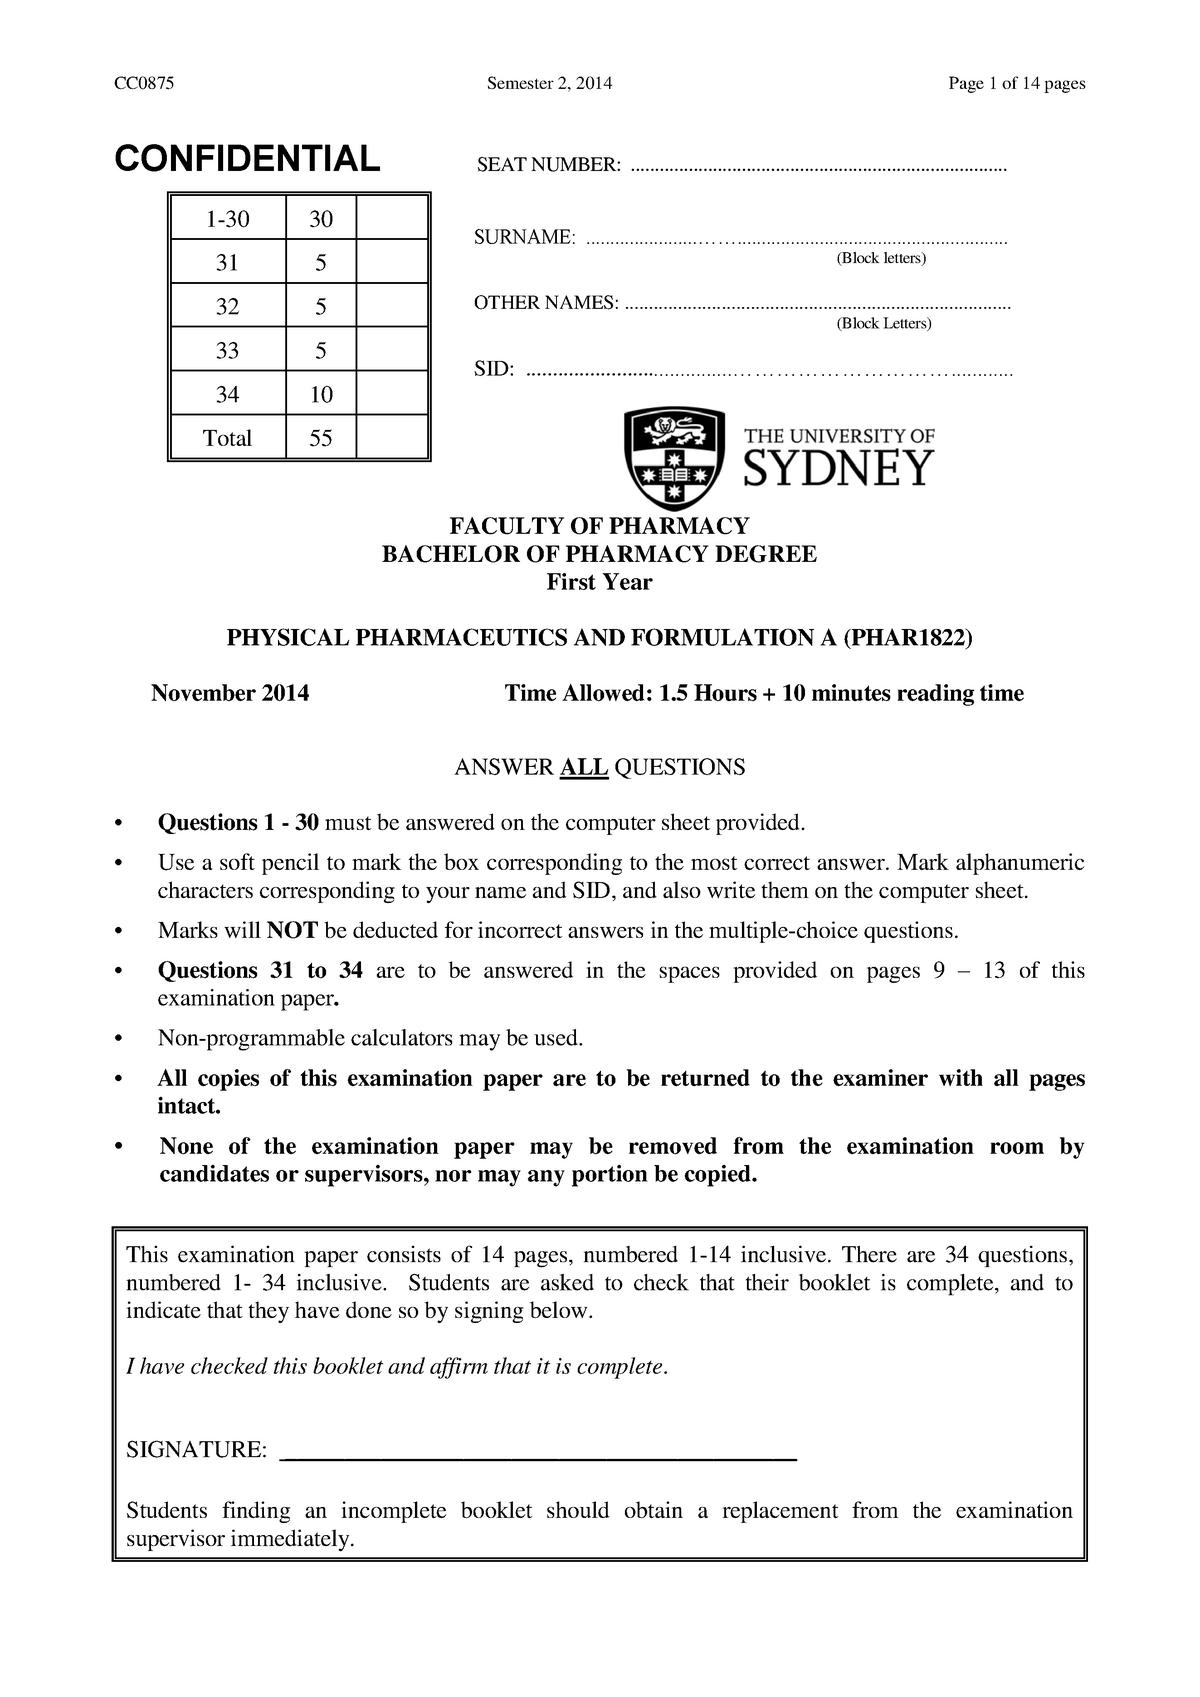 Exam 2014 - PHAR1822: Physical Pharmaceutics and Formulation A - StuDocu